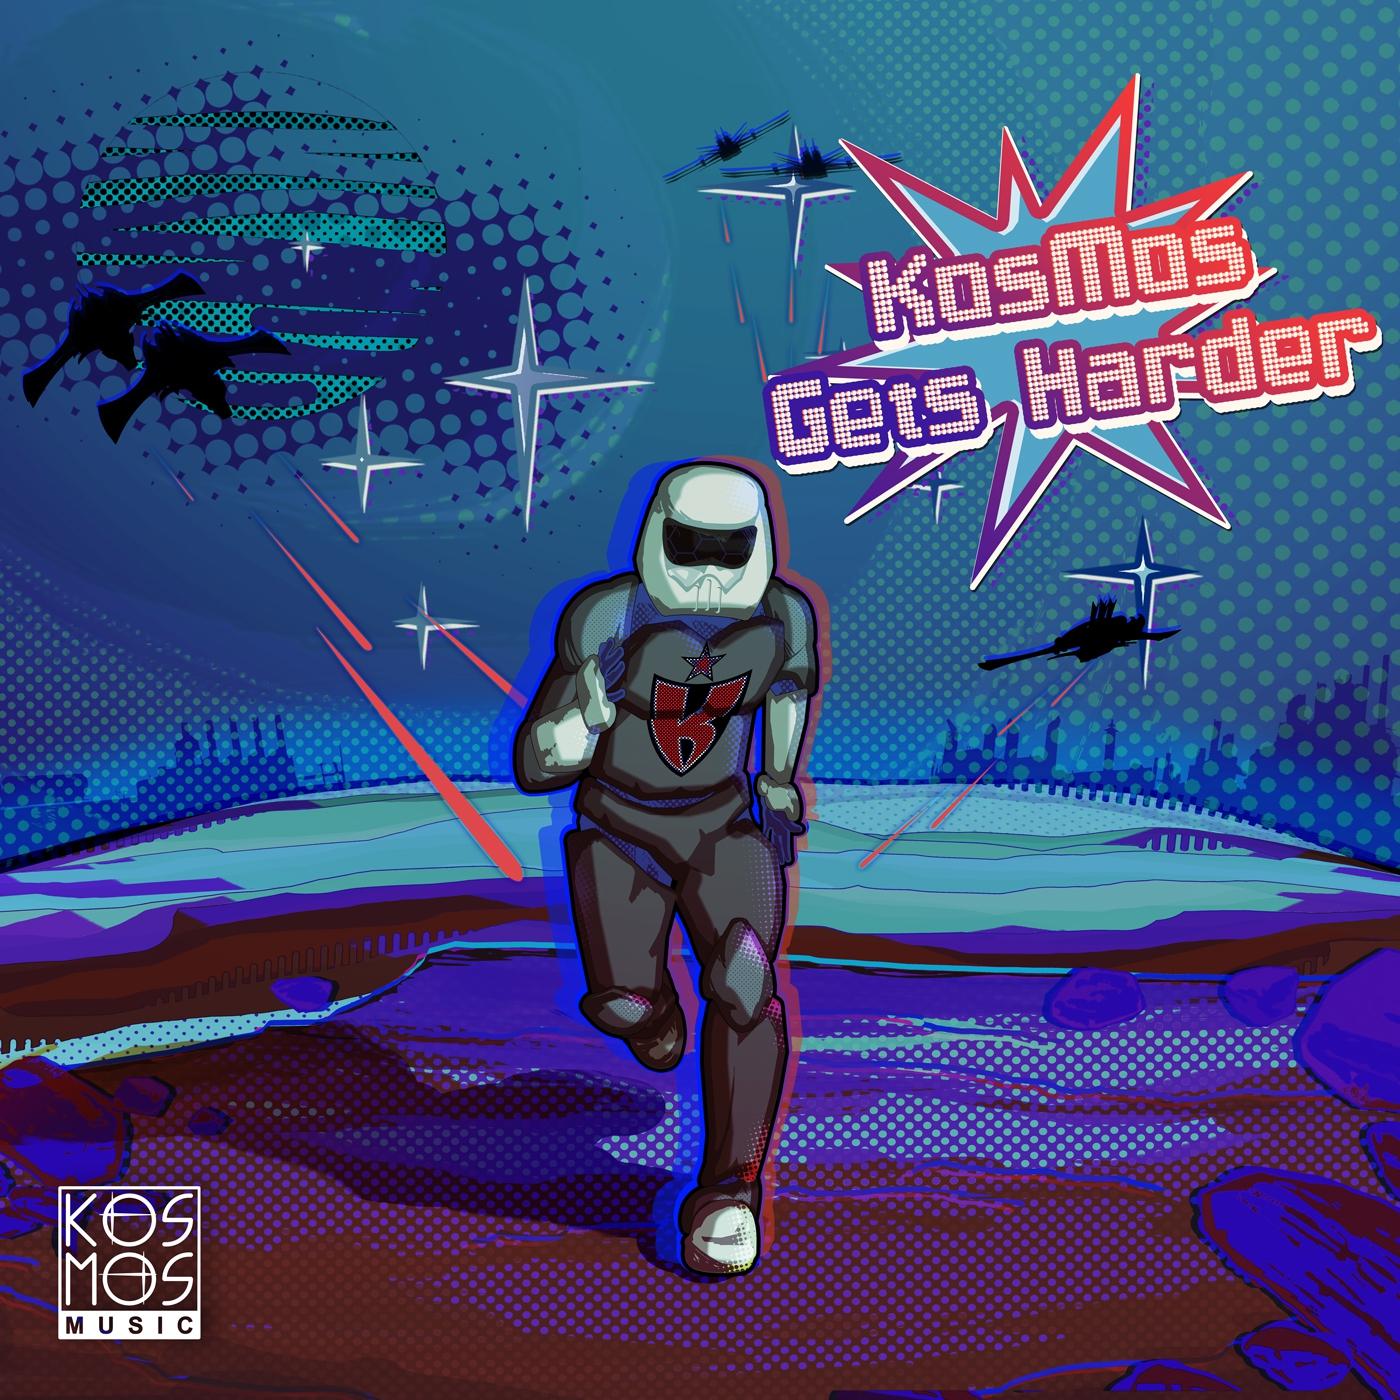 Future Engineers - Matter (Original Mix)